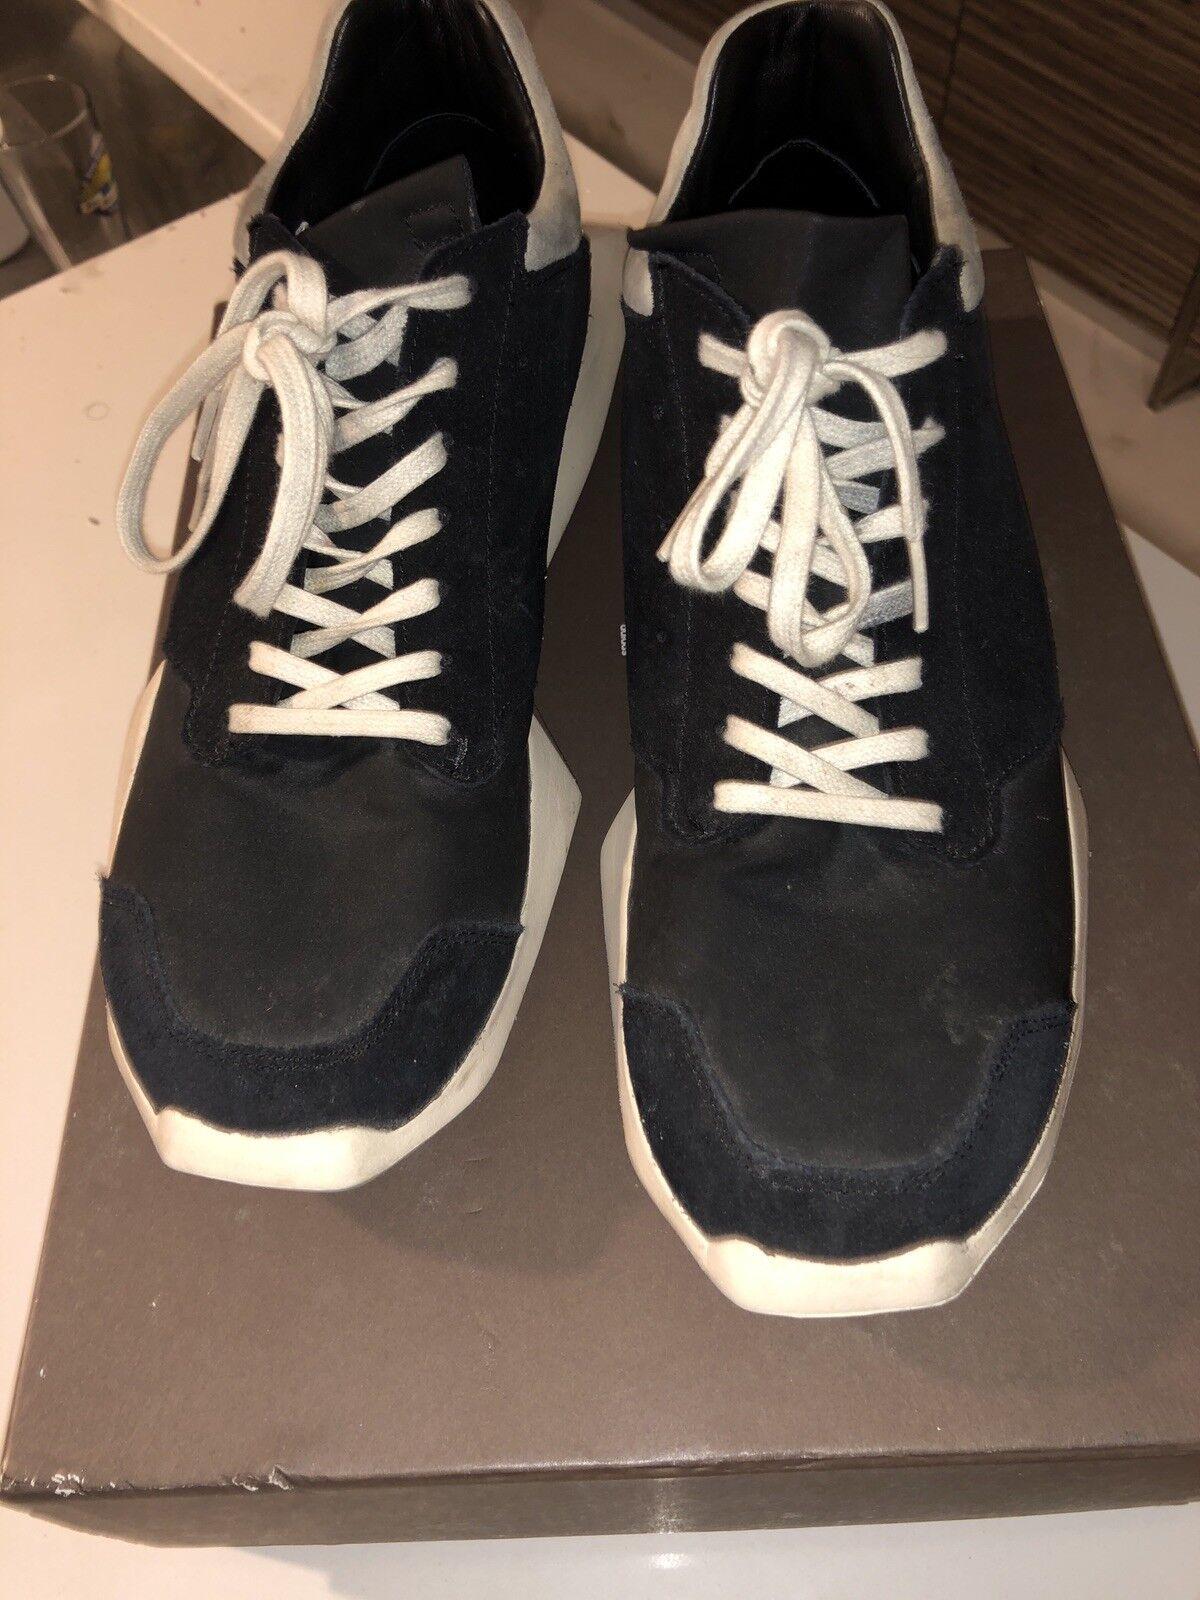 100% Adidas Rick Owens Tech Runner Black & White US 9.5